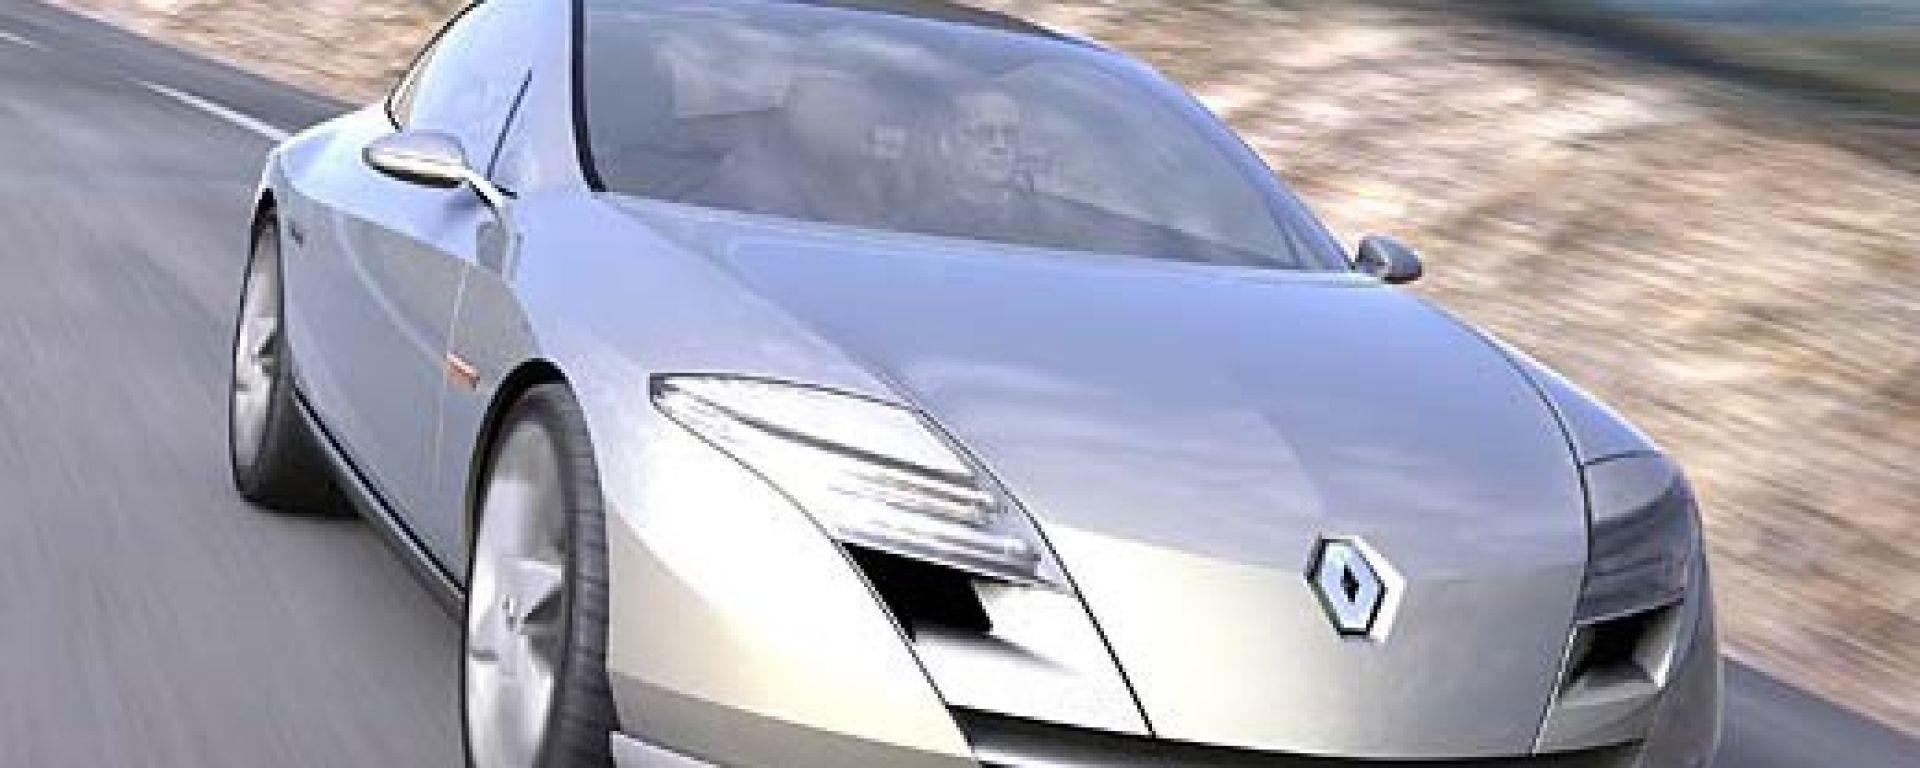 Anteprima: Renault Fluence